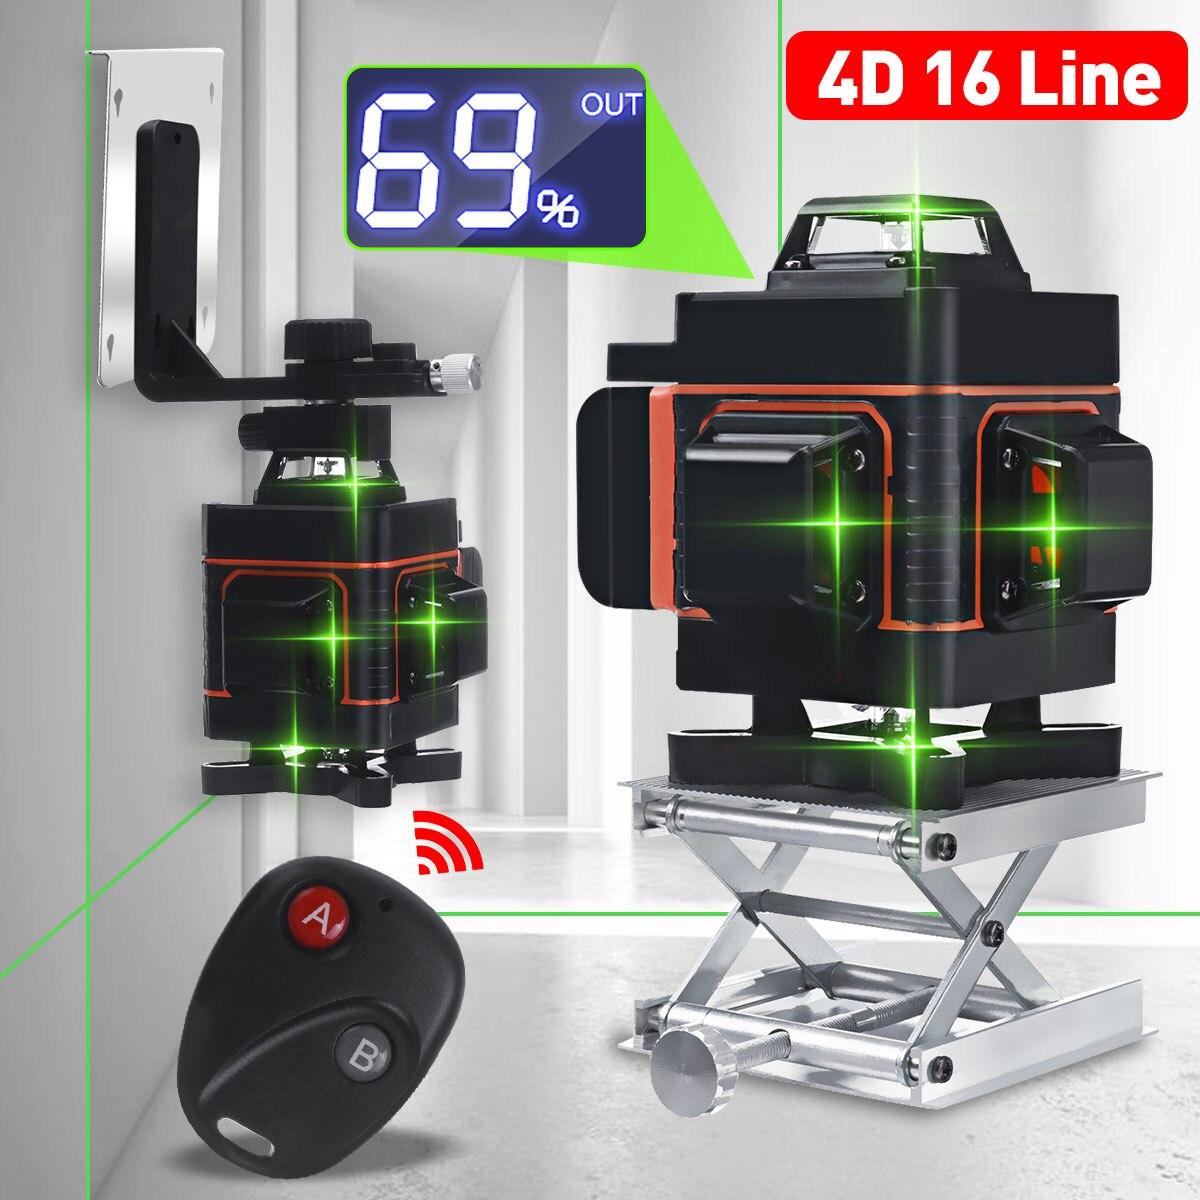 verde display led auto nivelamento 360 °